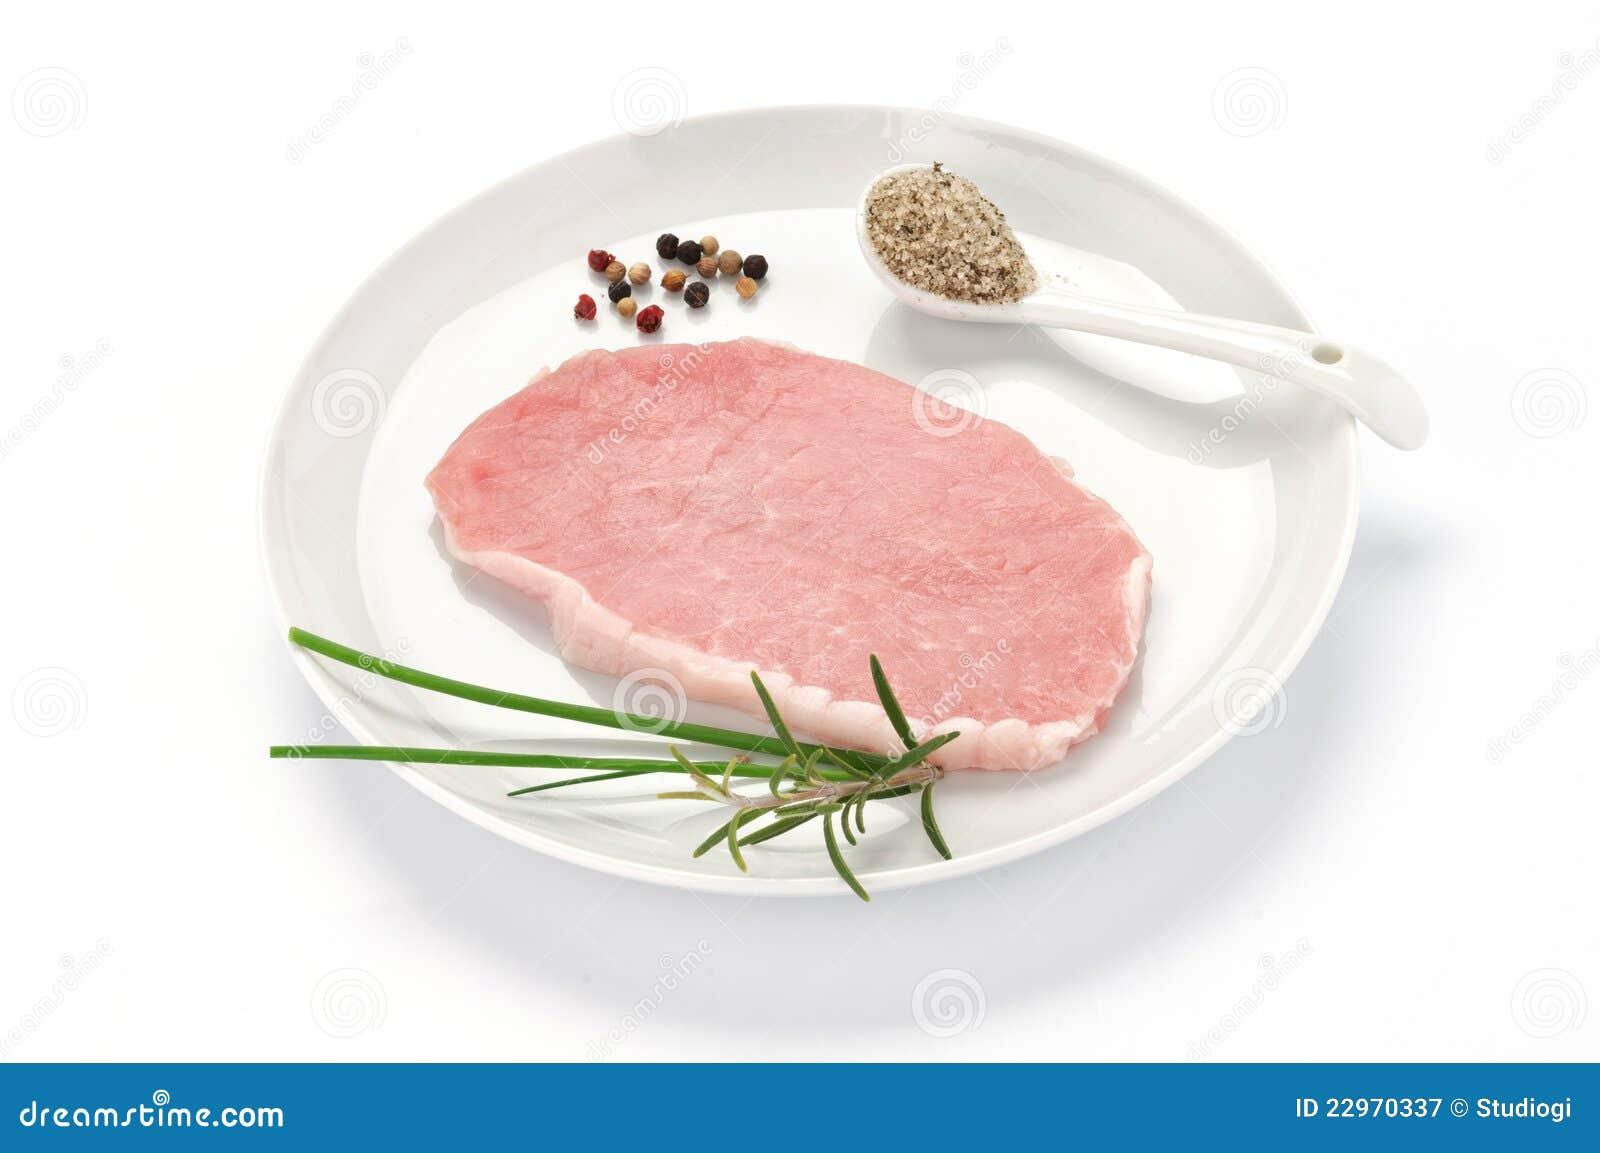 how to make pork loin slices